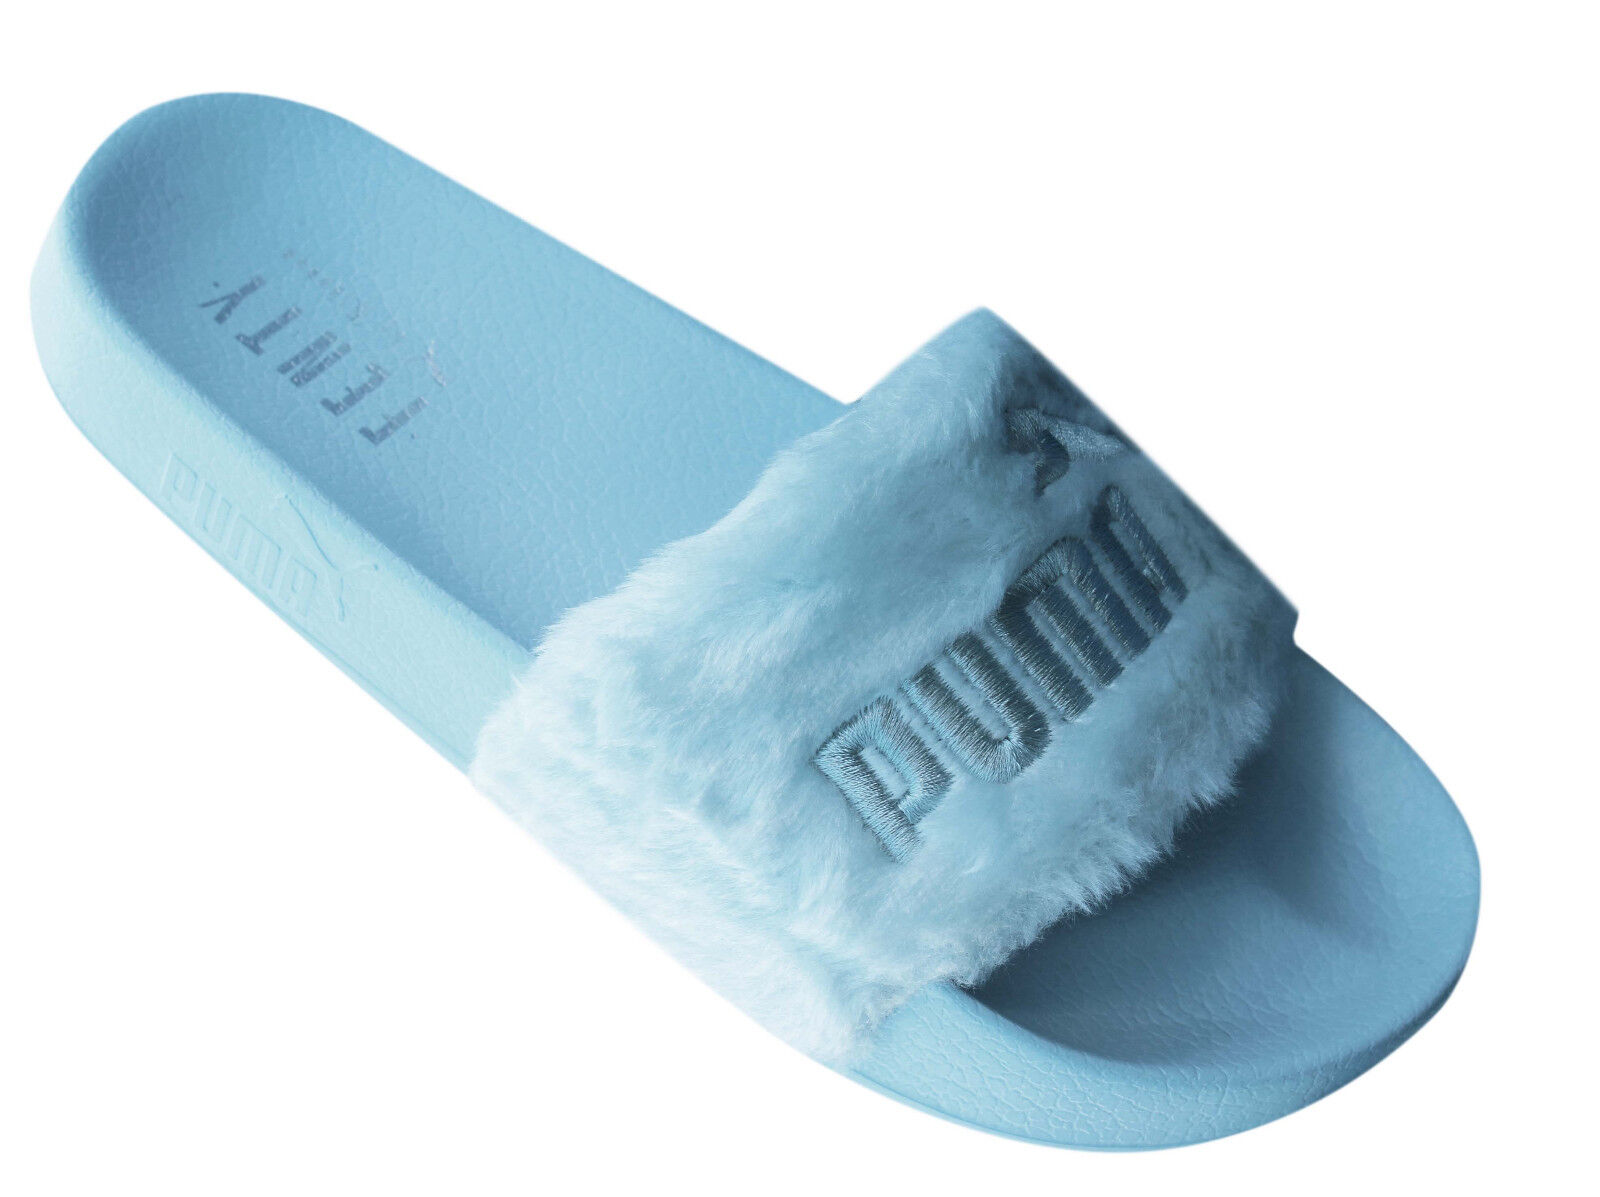 Puma Fenty Rihanna Fur Slip On Sliders Mens Flip Flops Sandals 364402 03 D51